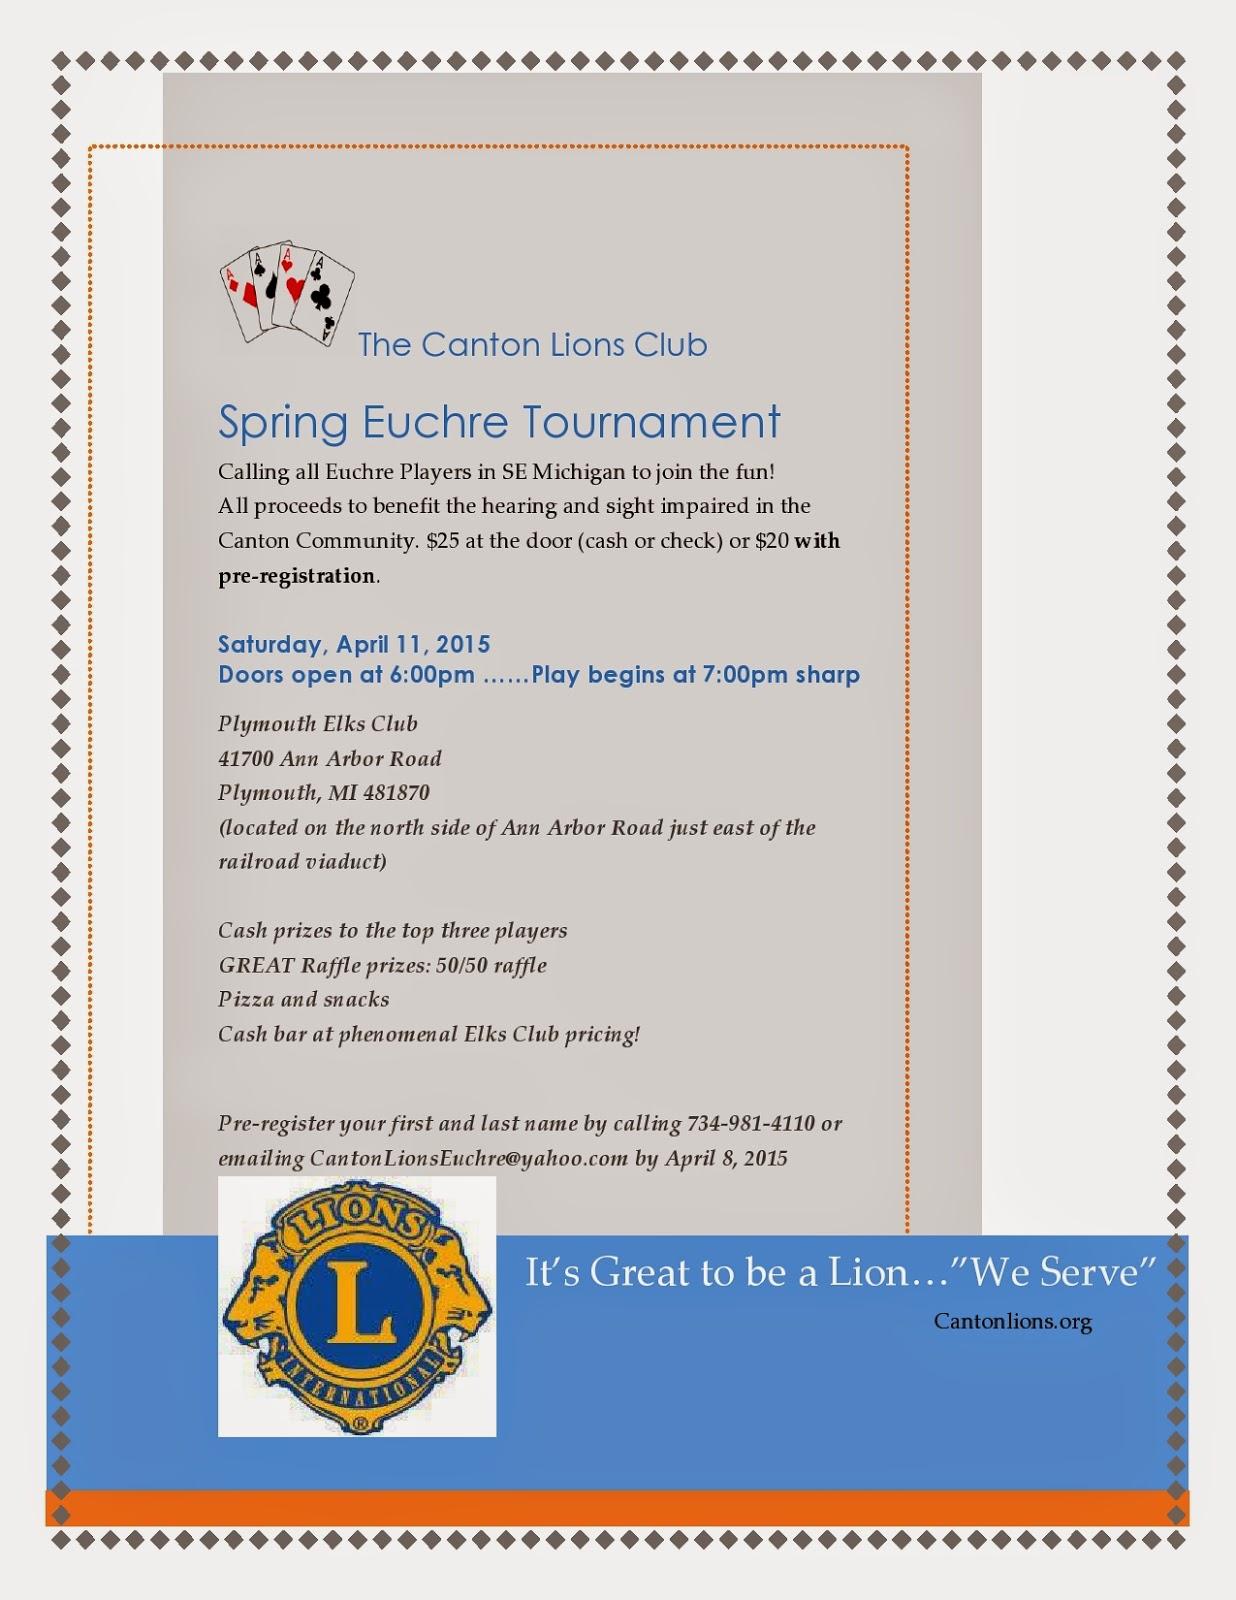 Lions Euchre Tournament Fundraiser